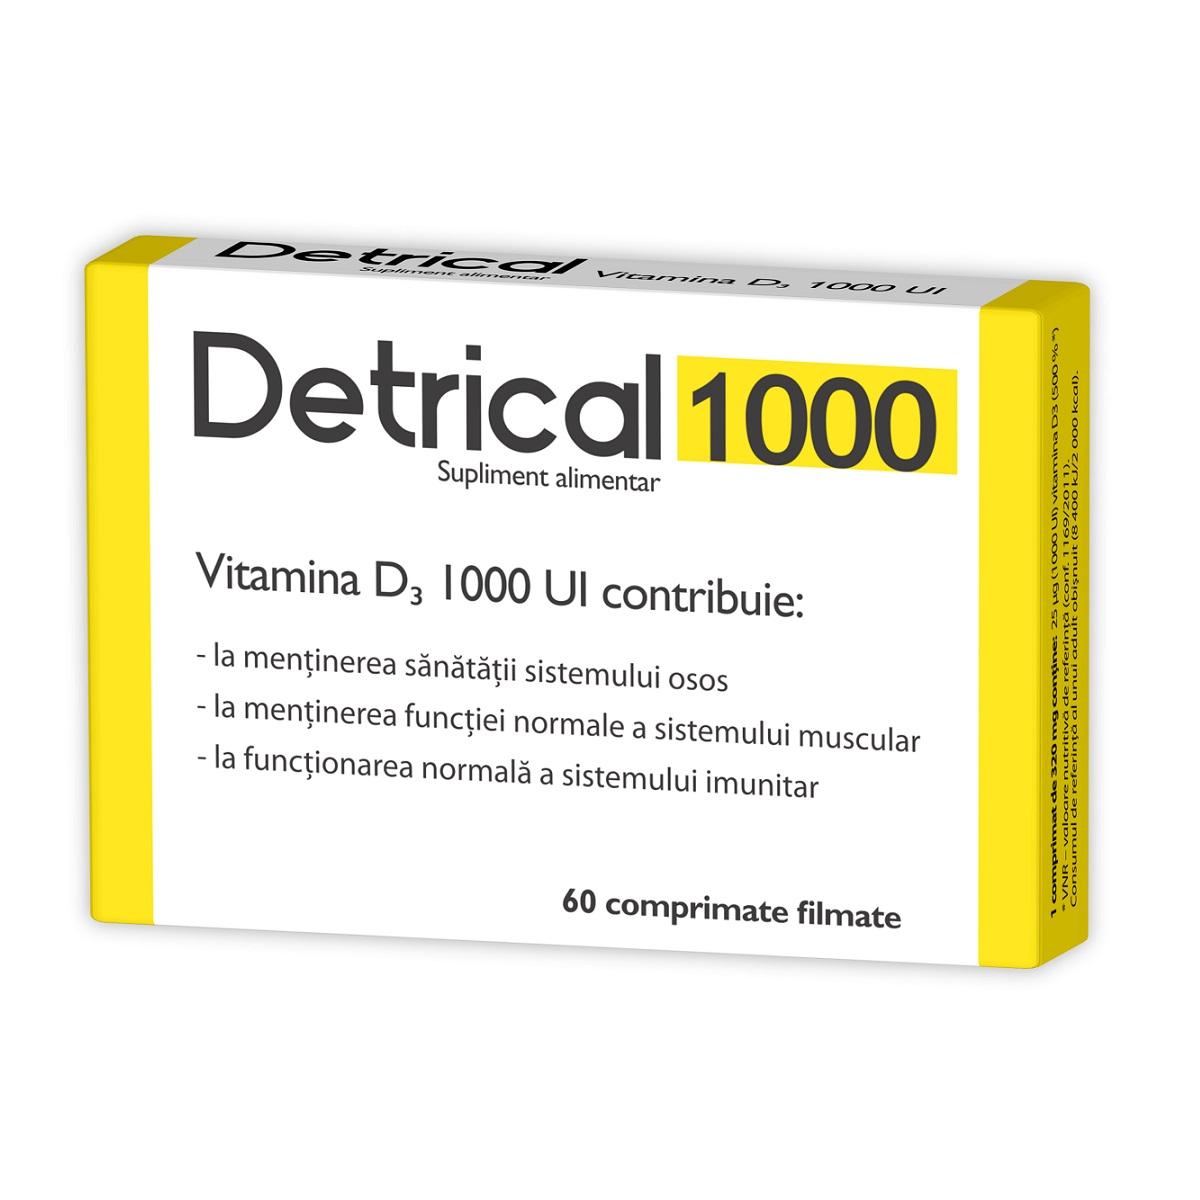 Detrical vitamina D 1000 UI, 60 comprimate, Zdrovit